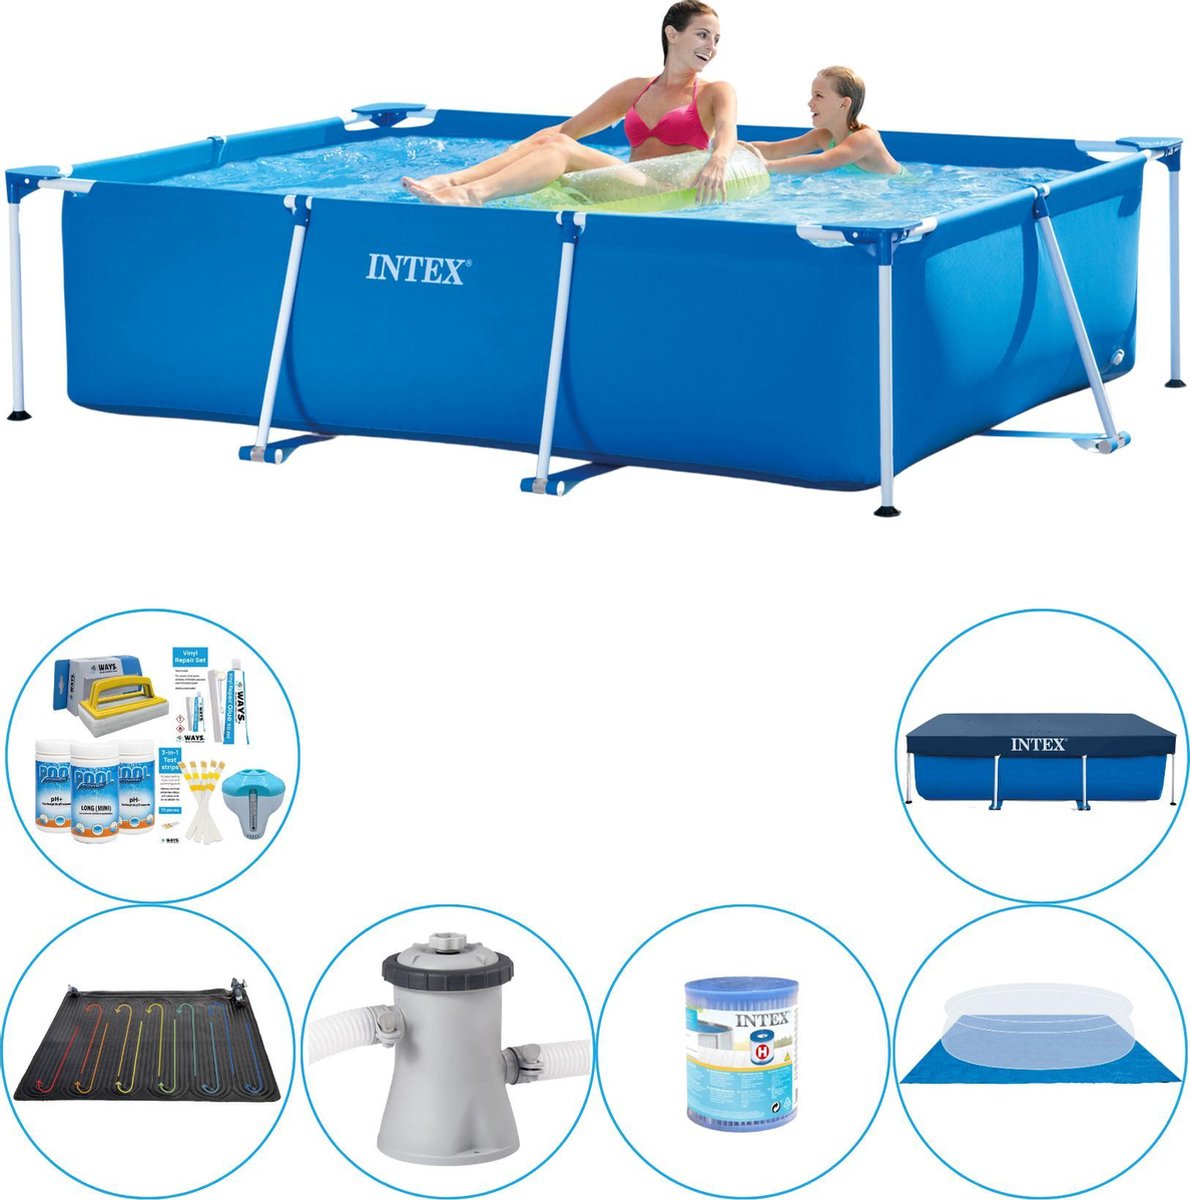 Intex Frame Pool Rechthoekig 220x150x60 cm - Zwembad Plus Accessoires